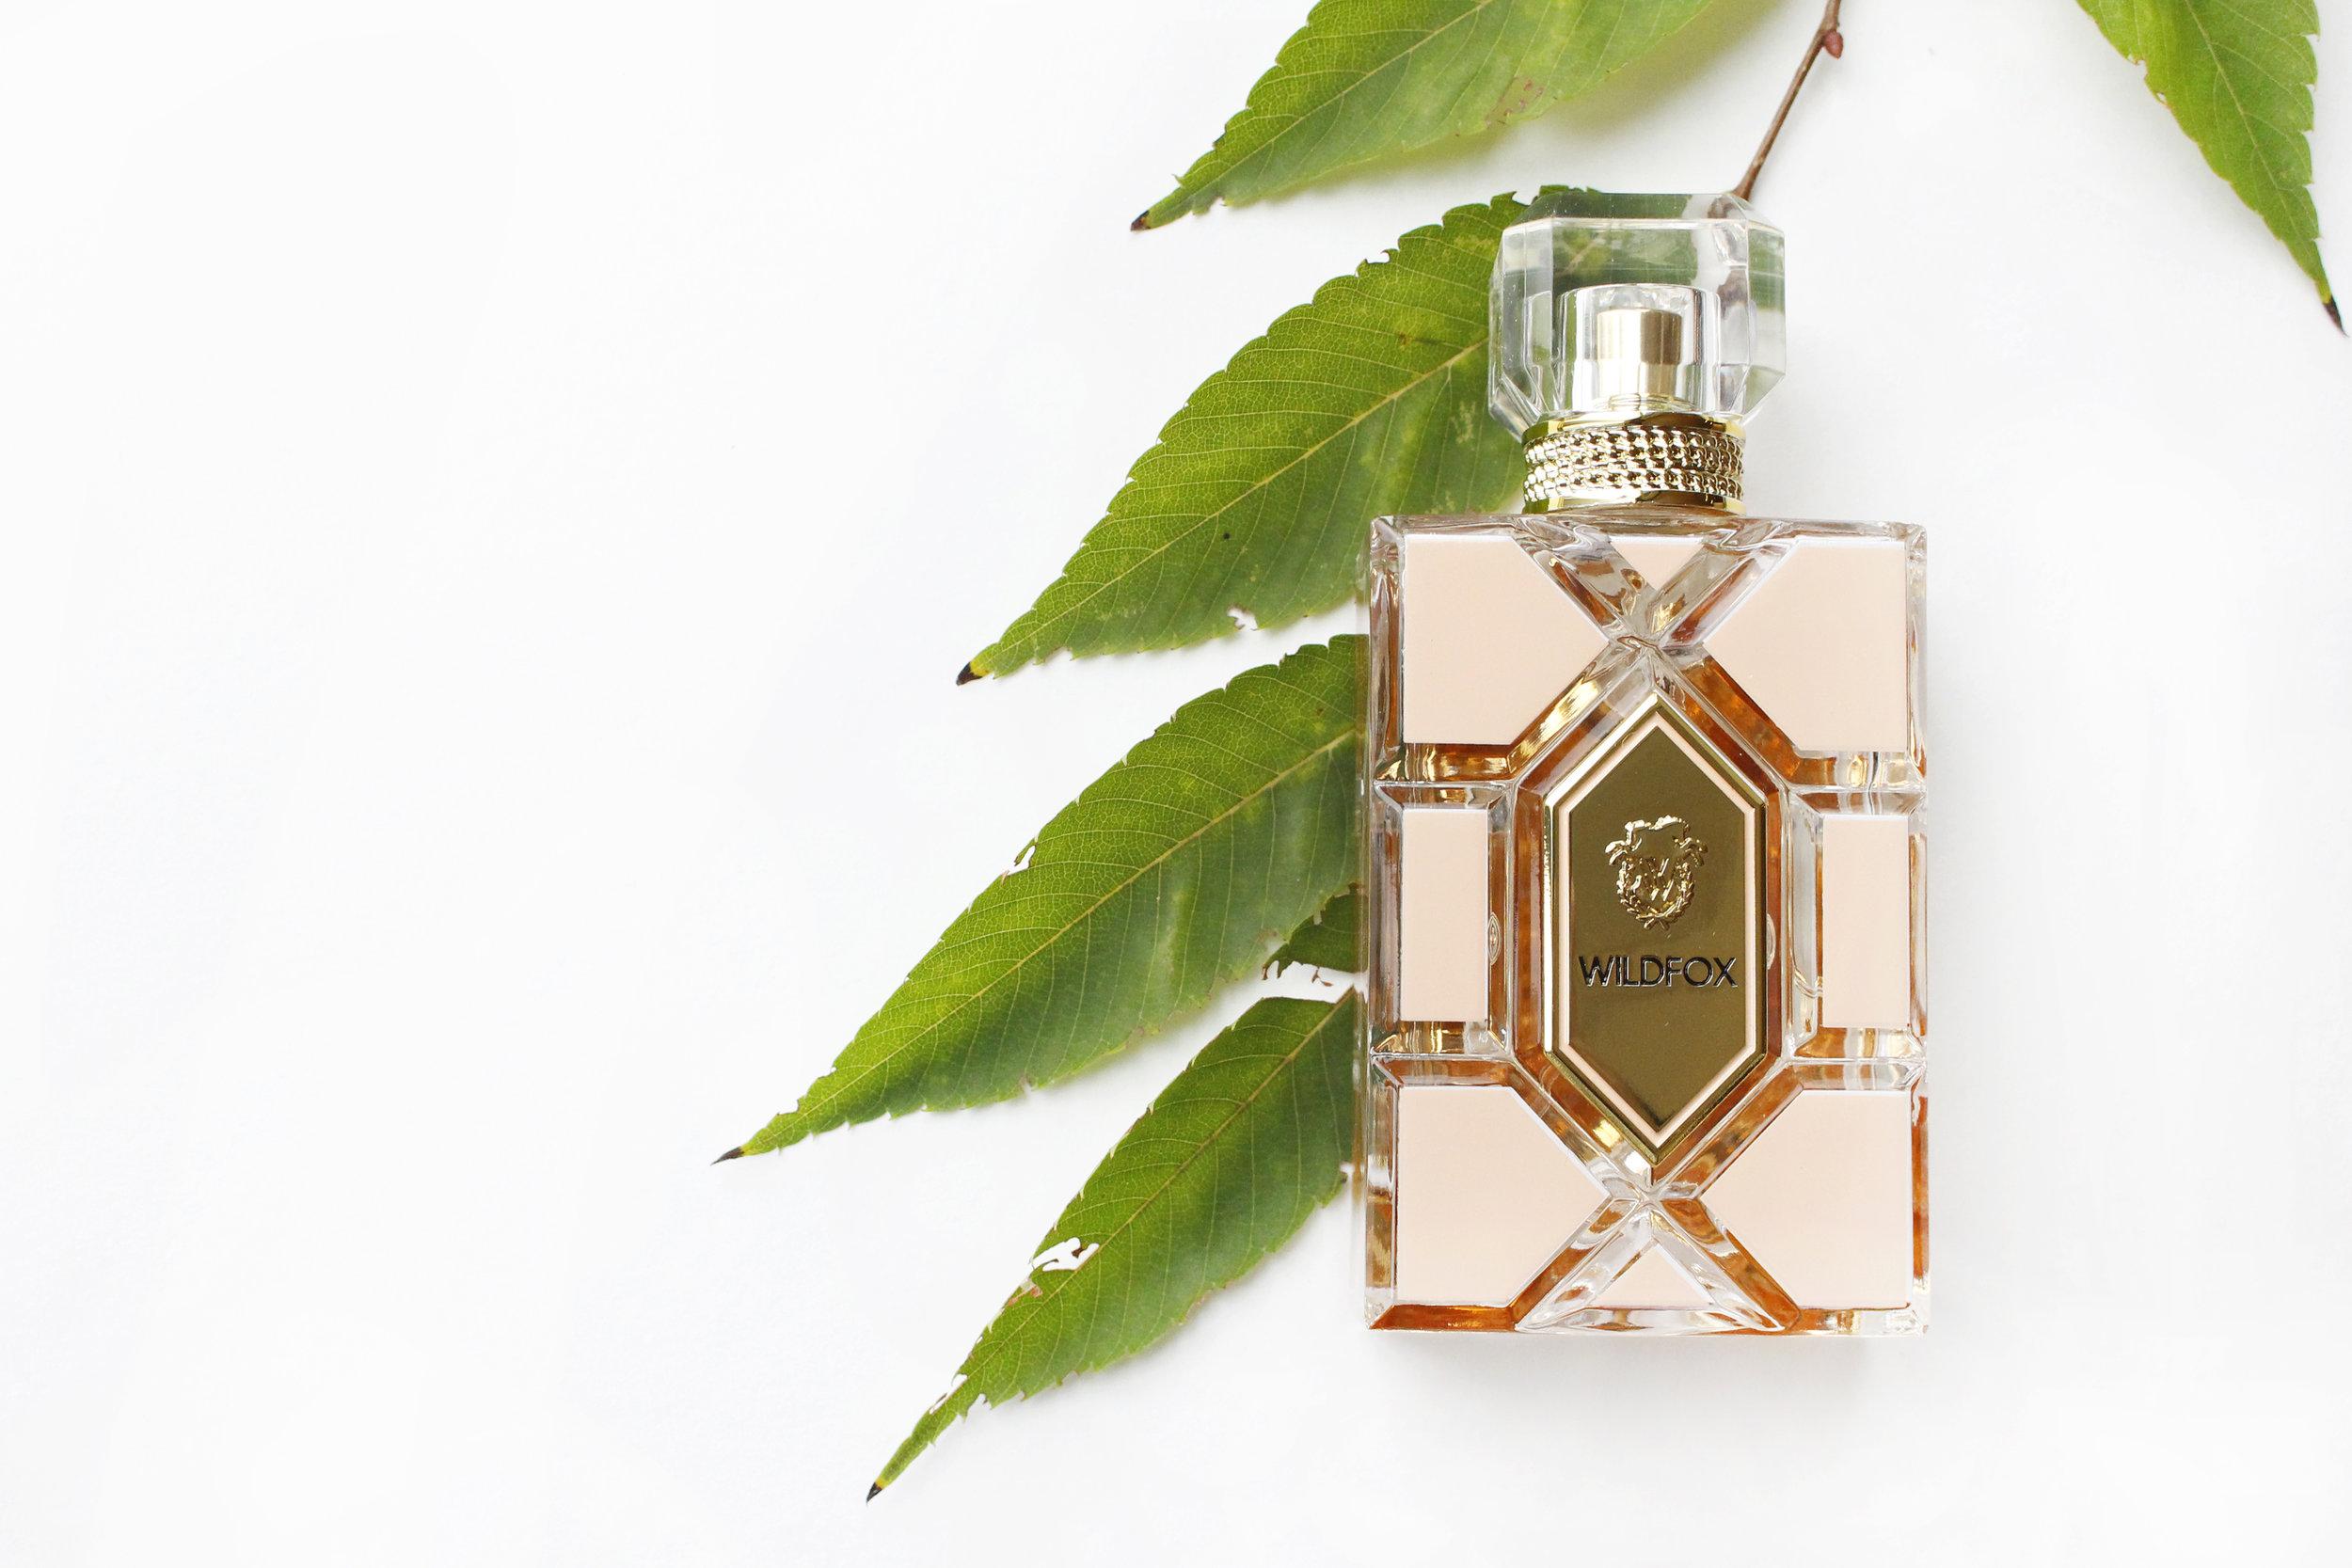 Notes: absinthe mist, apricot blush, incense, jasmine essence, dewy honeysuckle, white camellia, captive musk, honey, ambrox